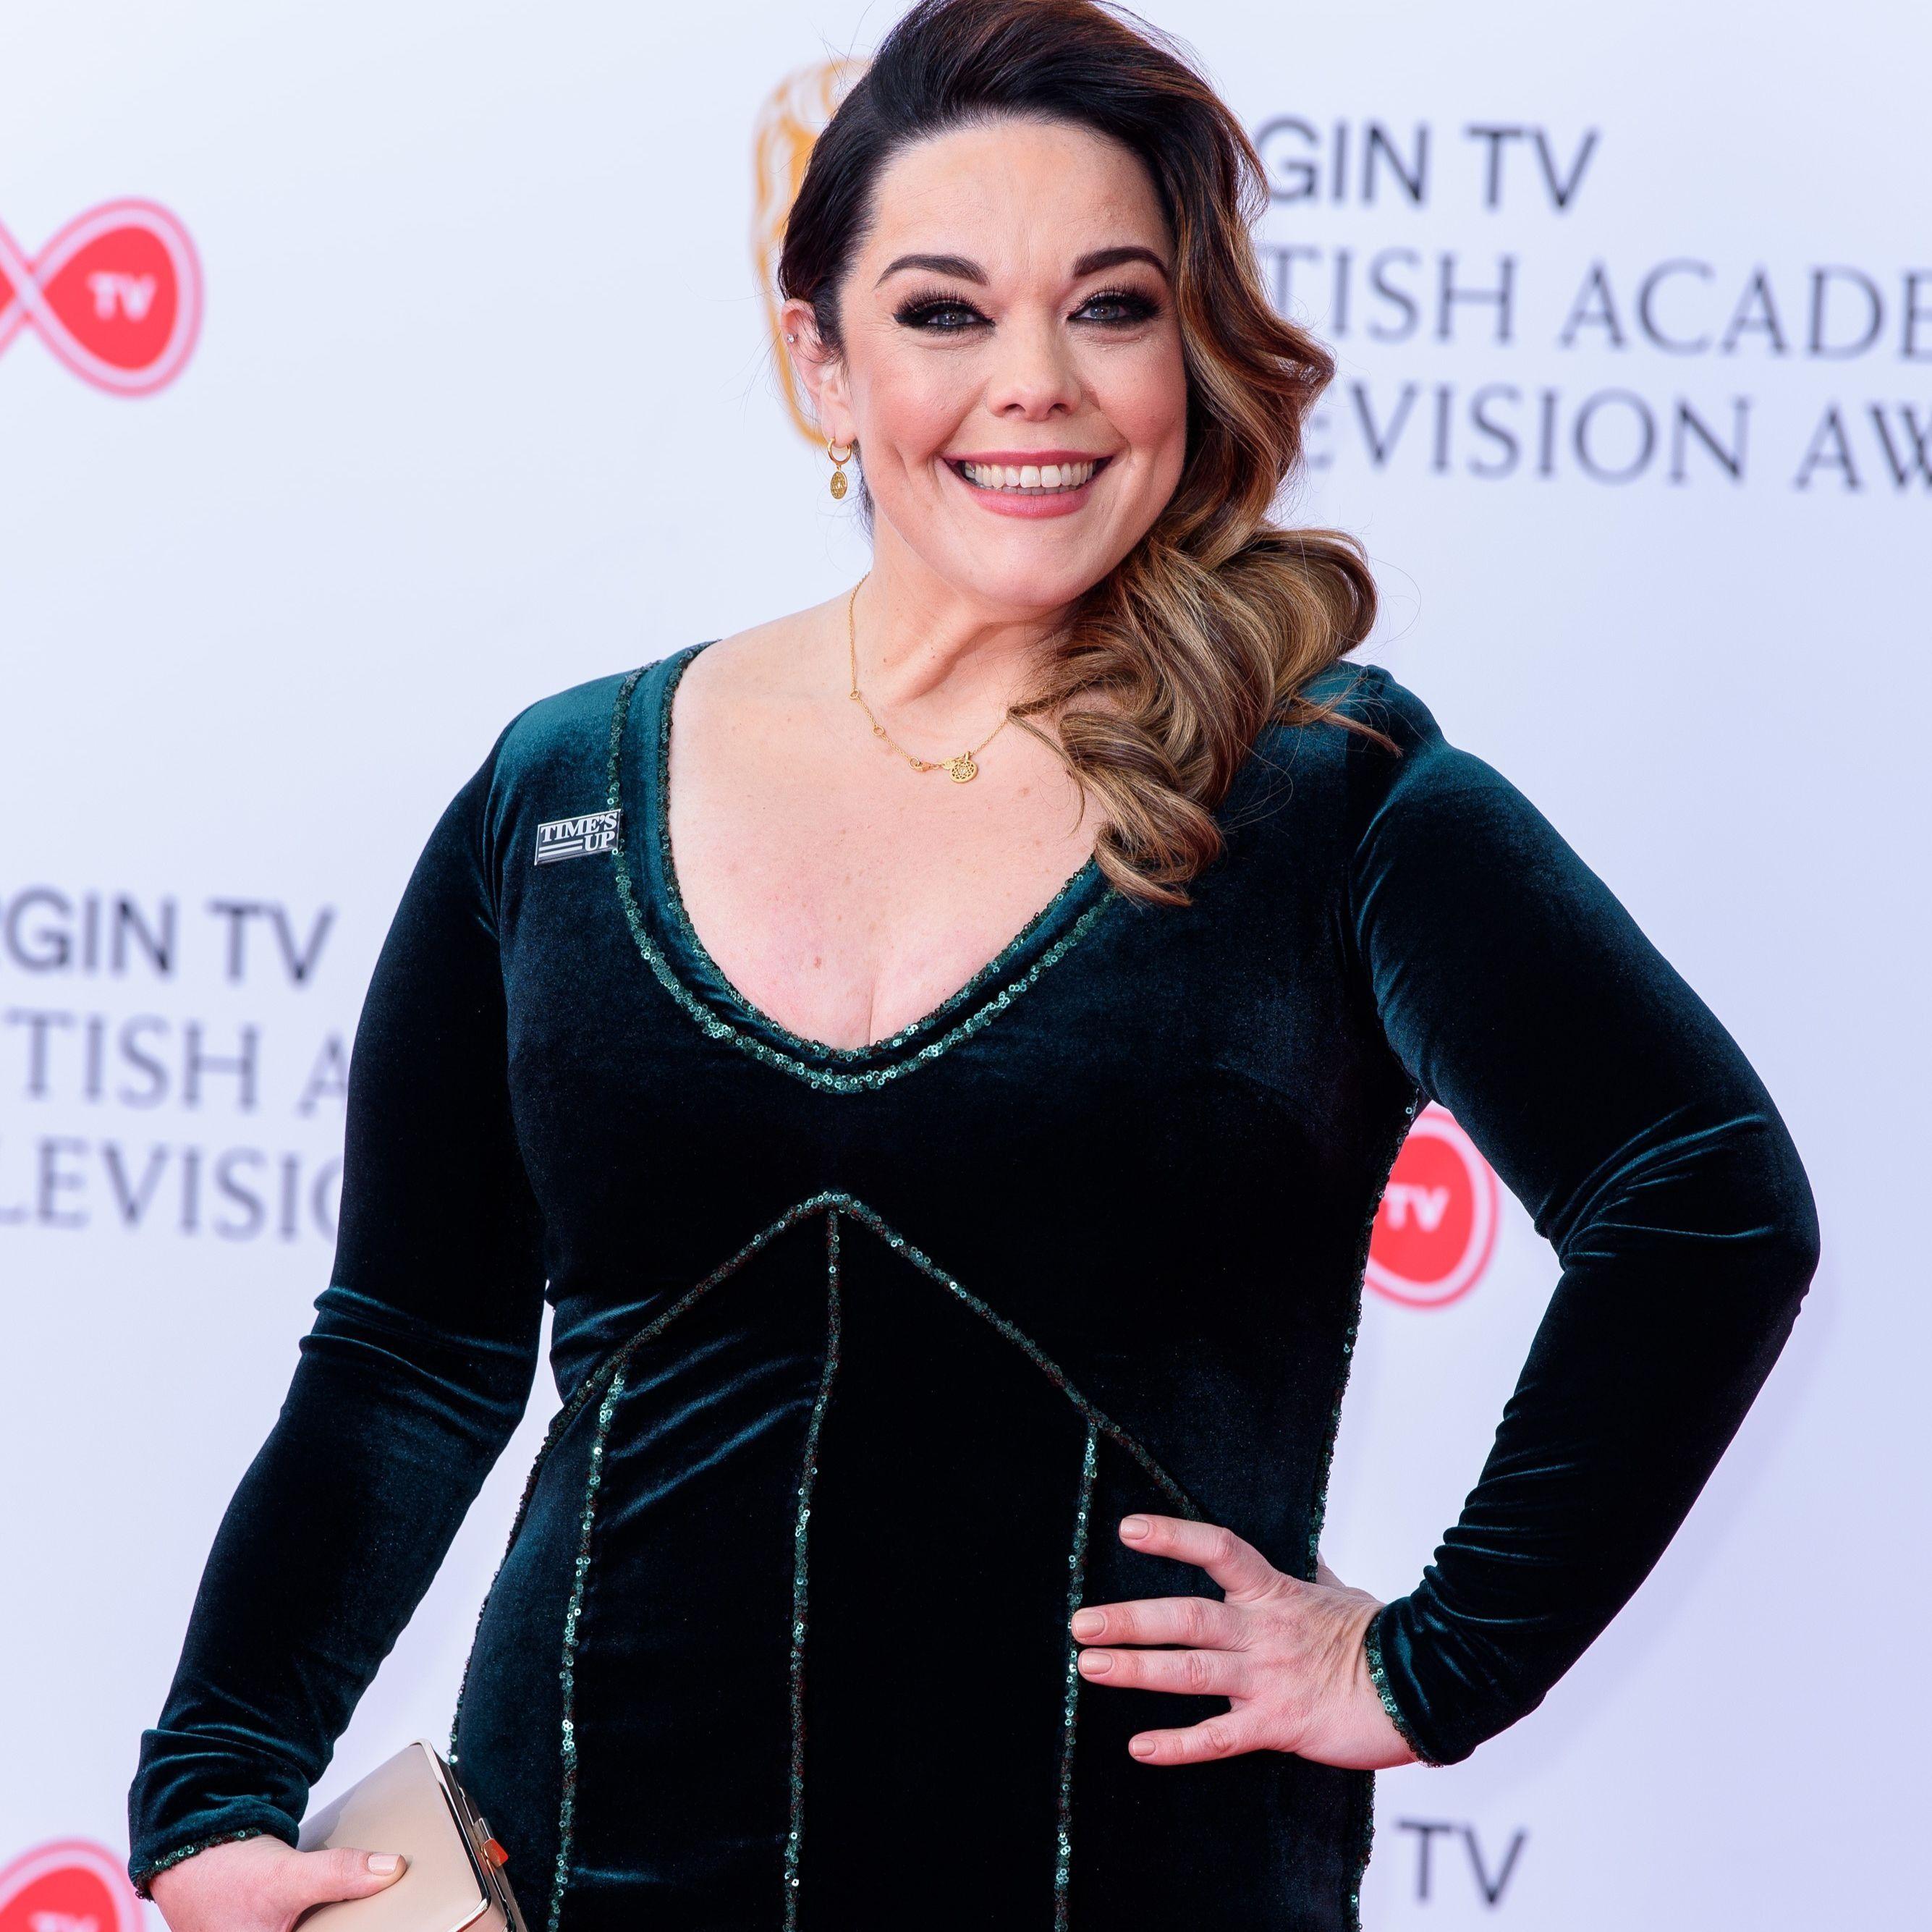 Emmerdale's Lisa Riley reveals big tensions for Mandy Dingle and Robert Sugden